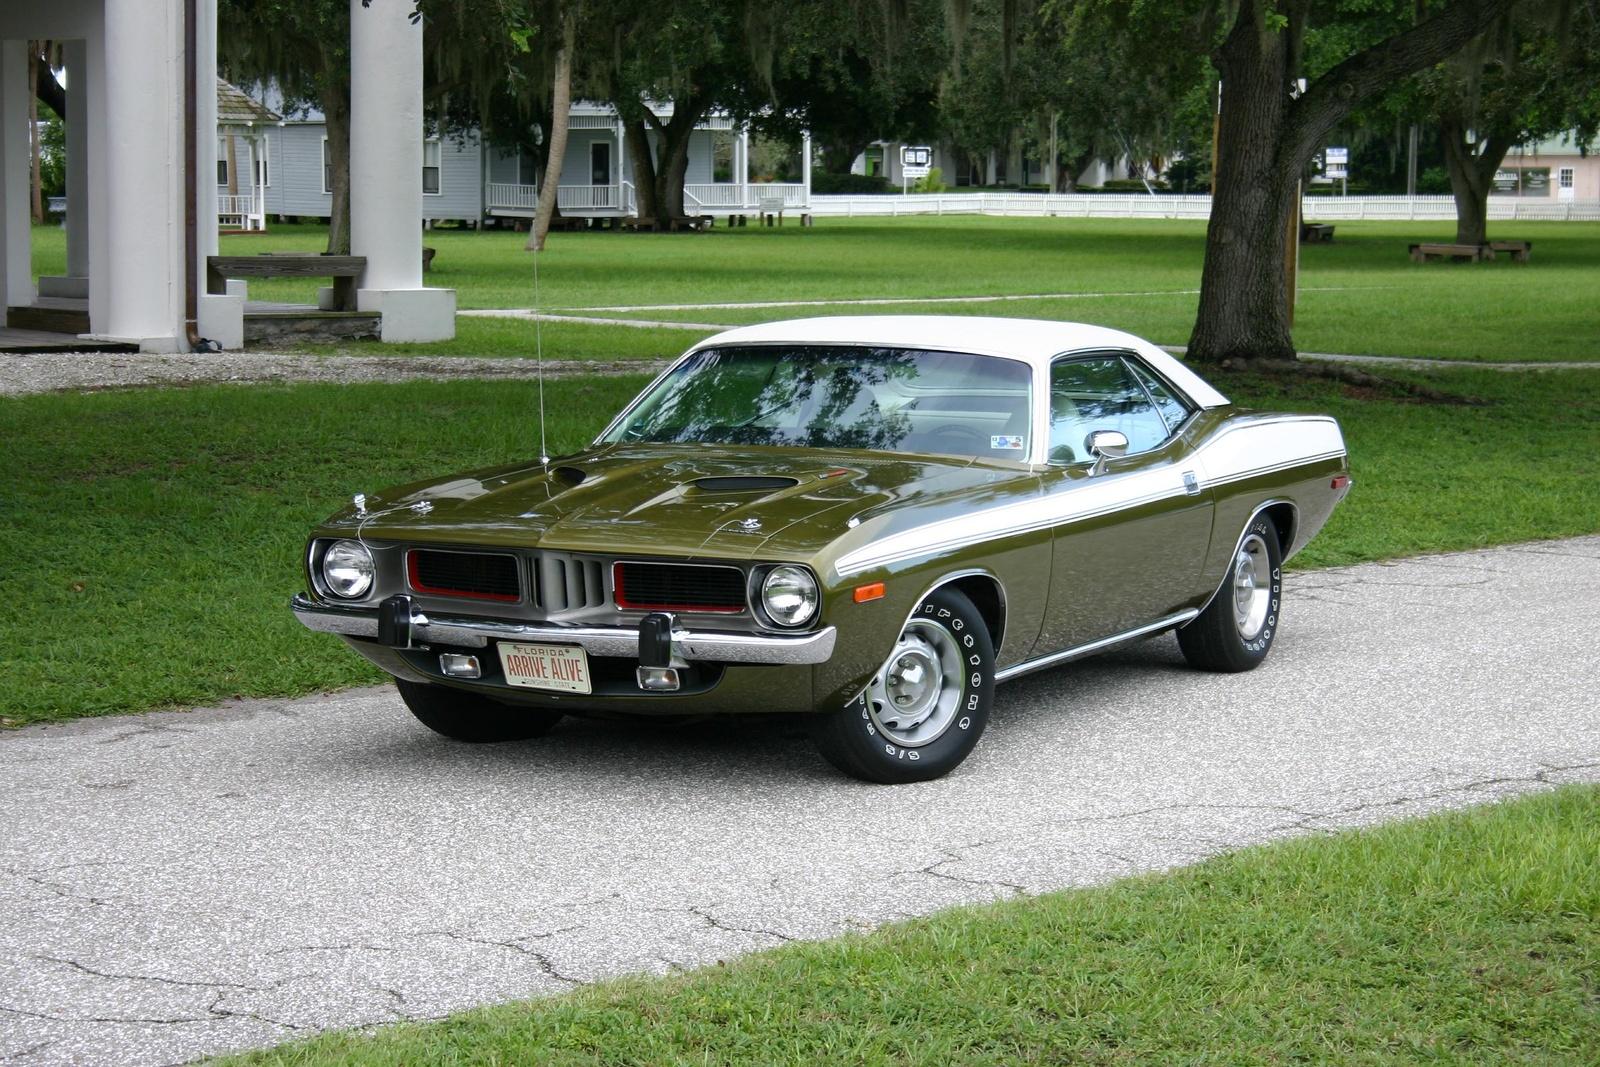 barracuda car 1974 -#main